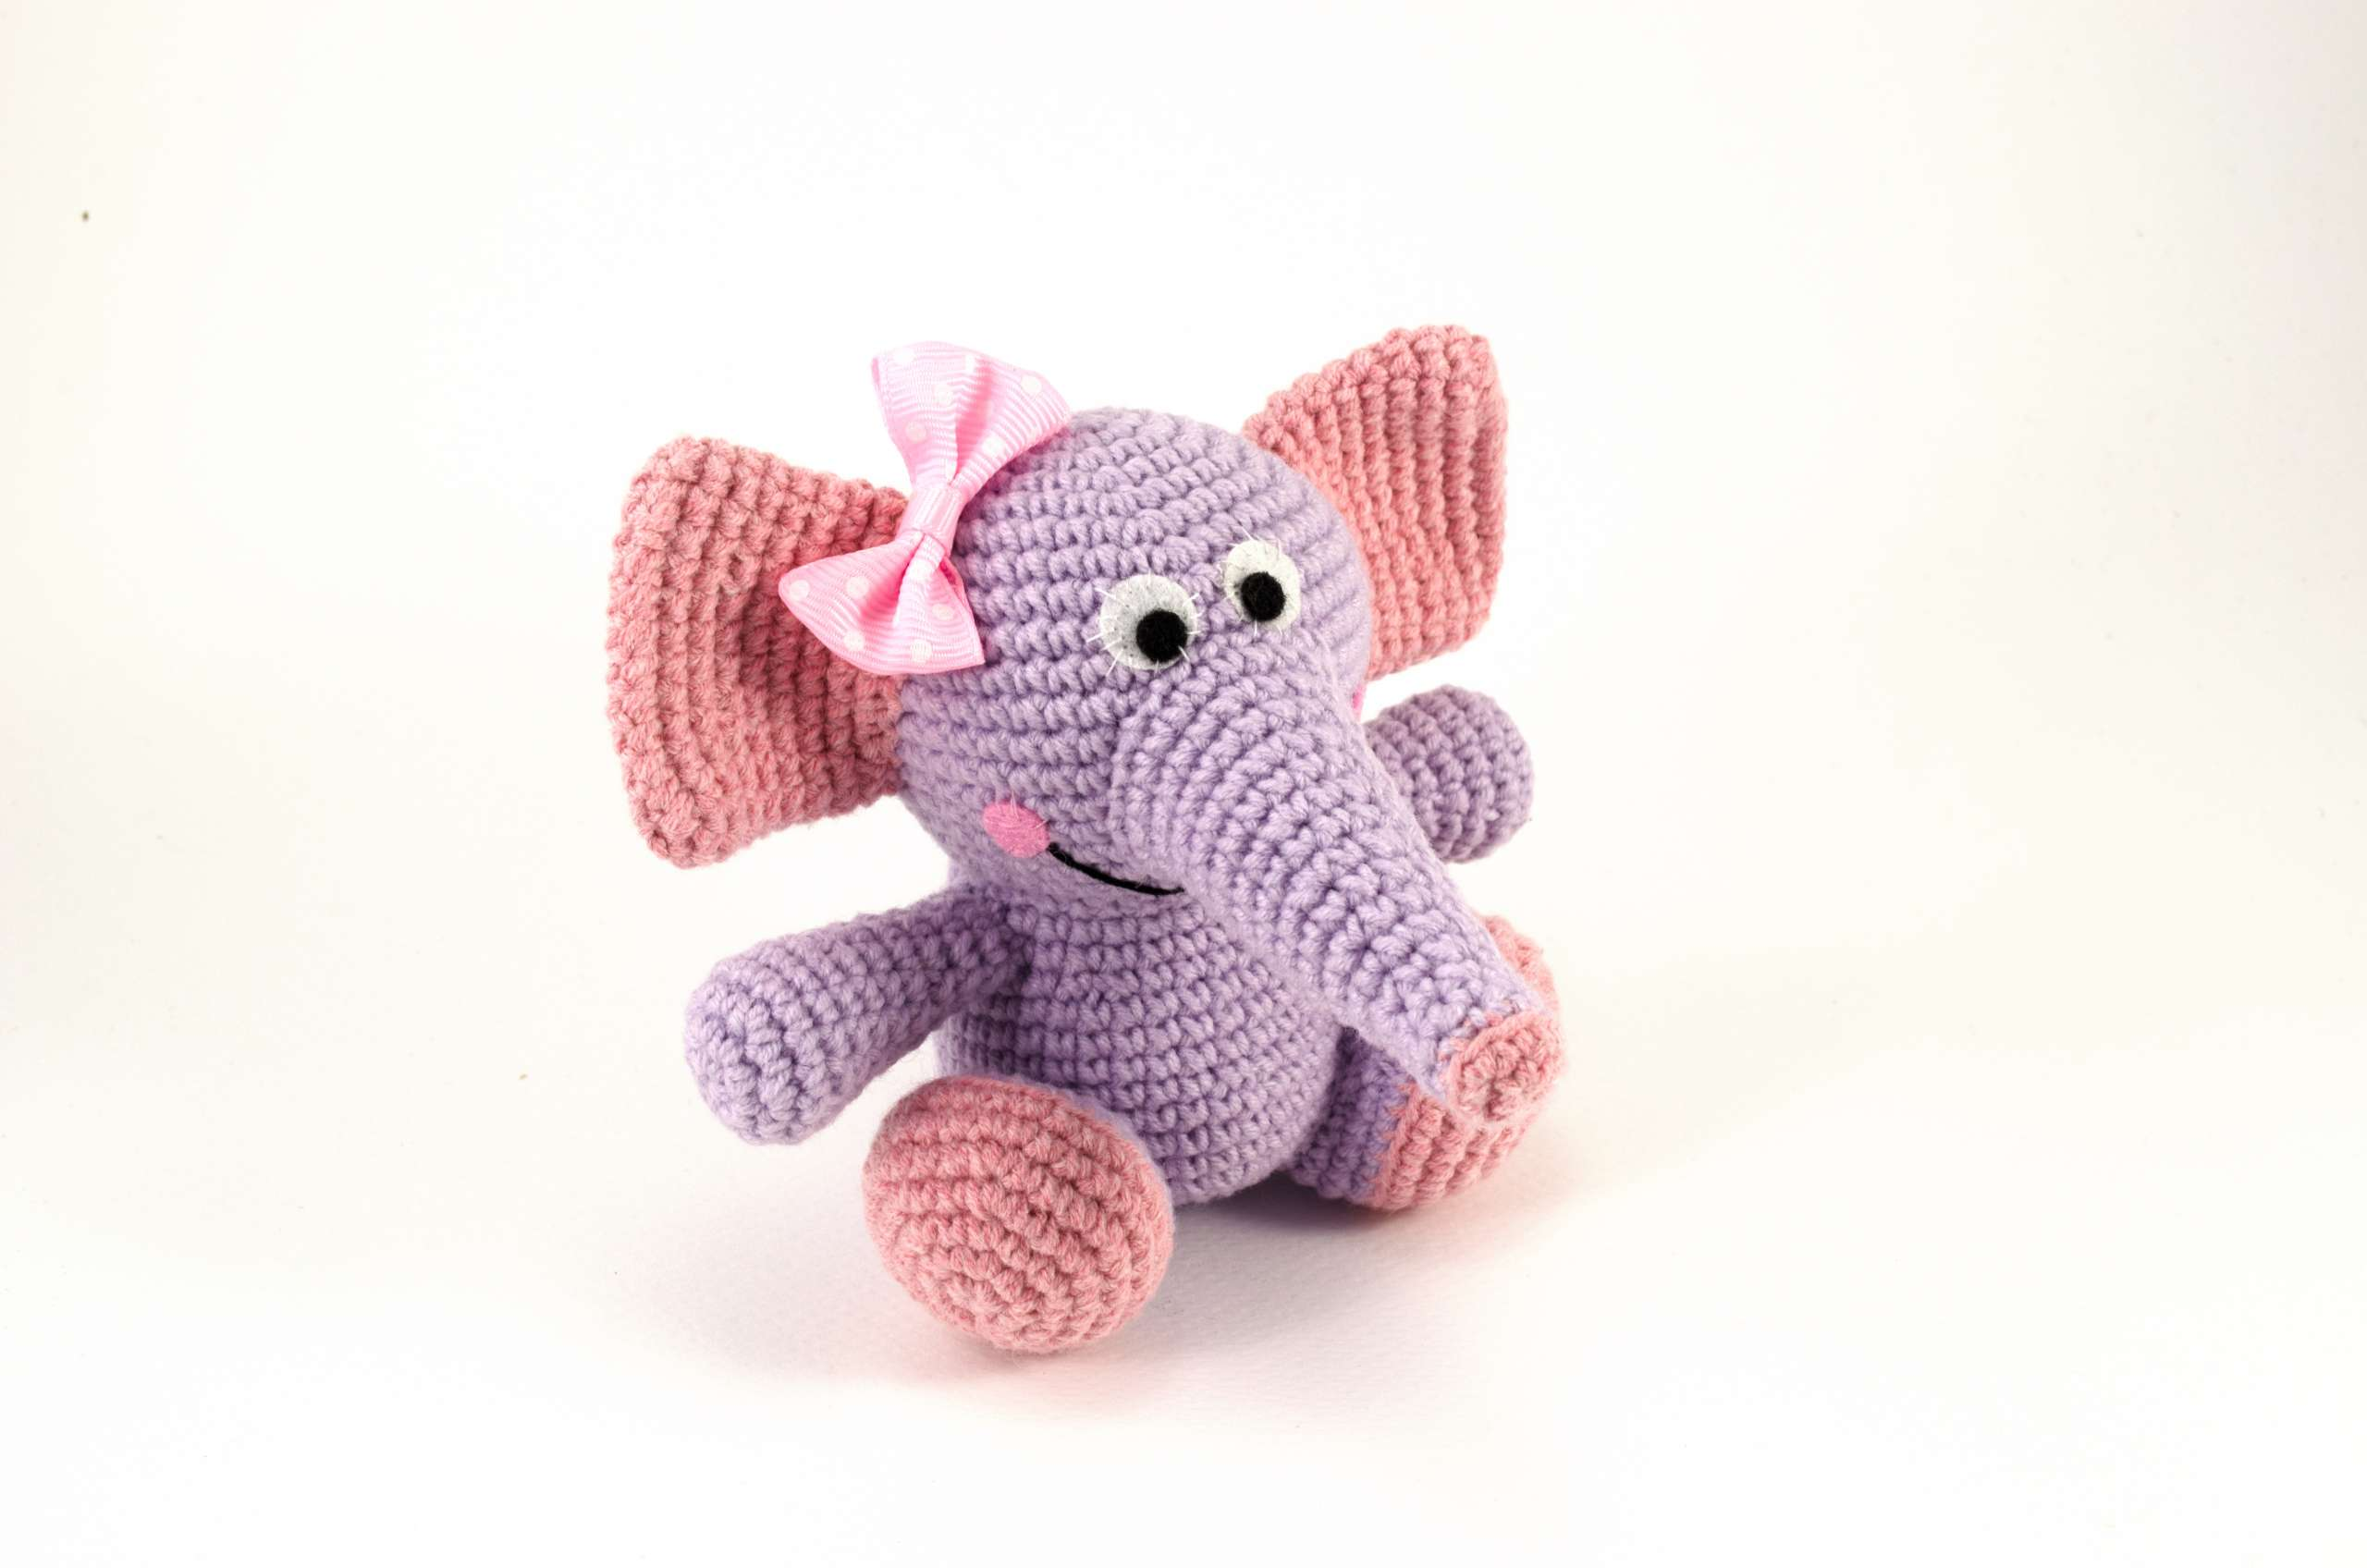 crochet tammy the purple baby elephant